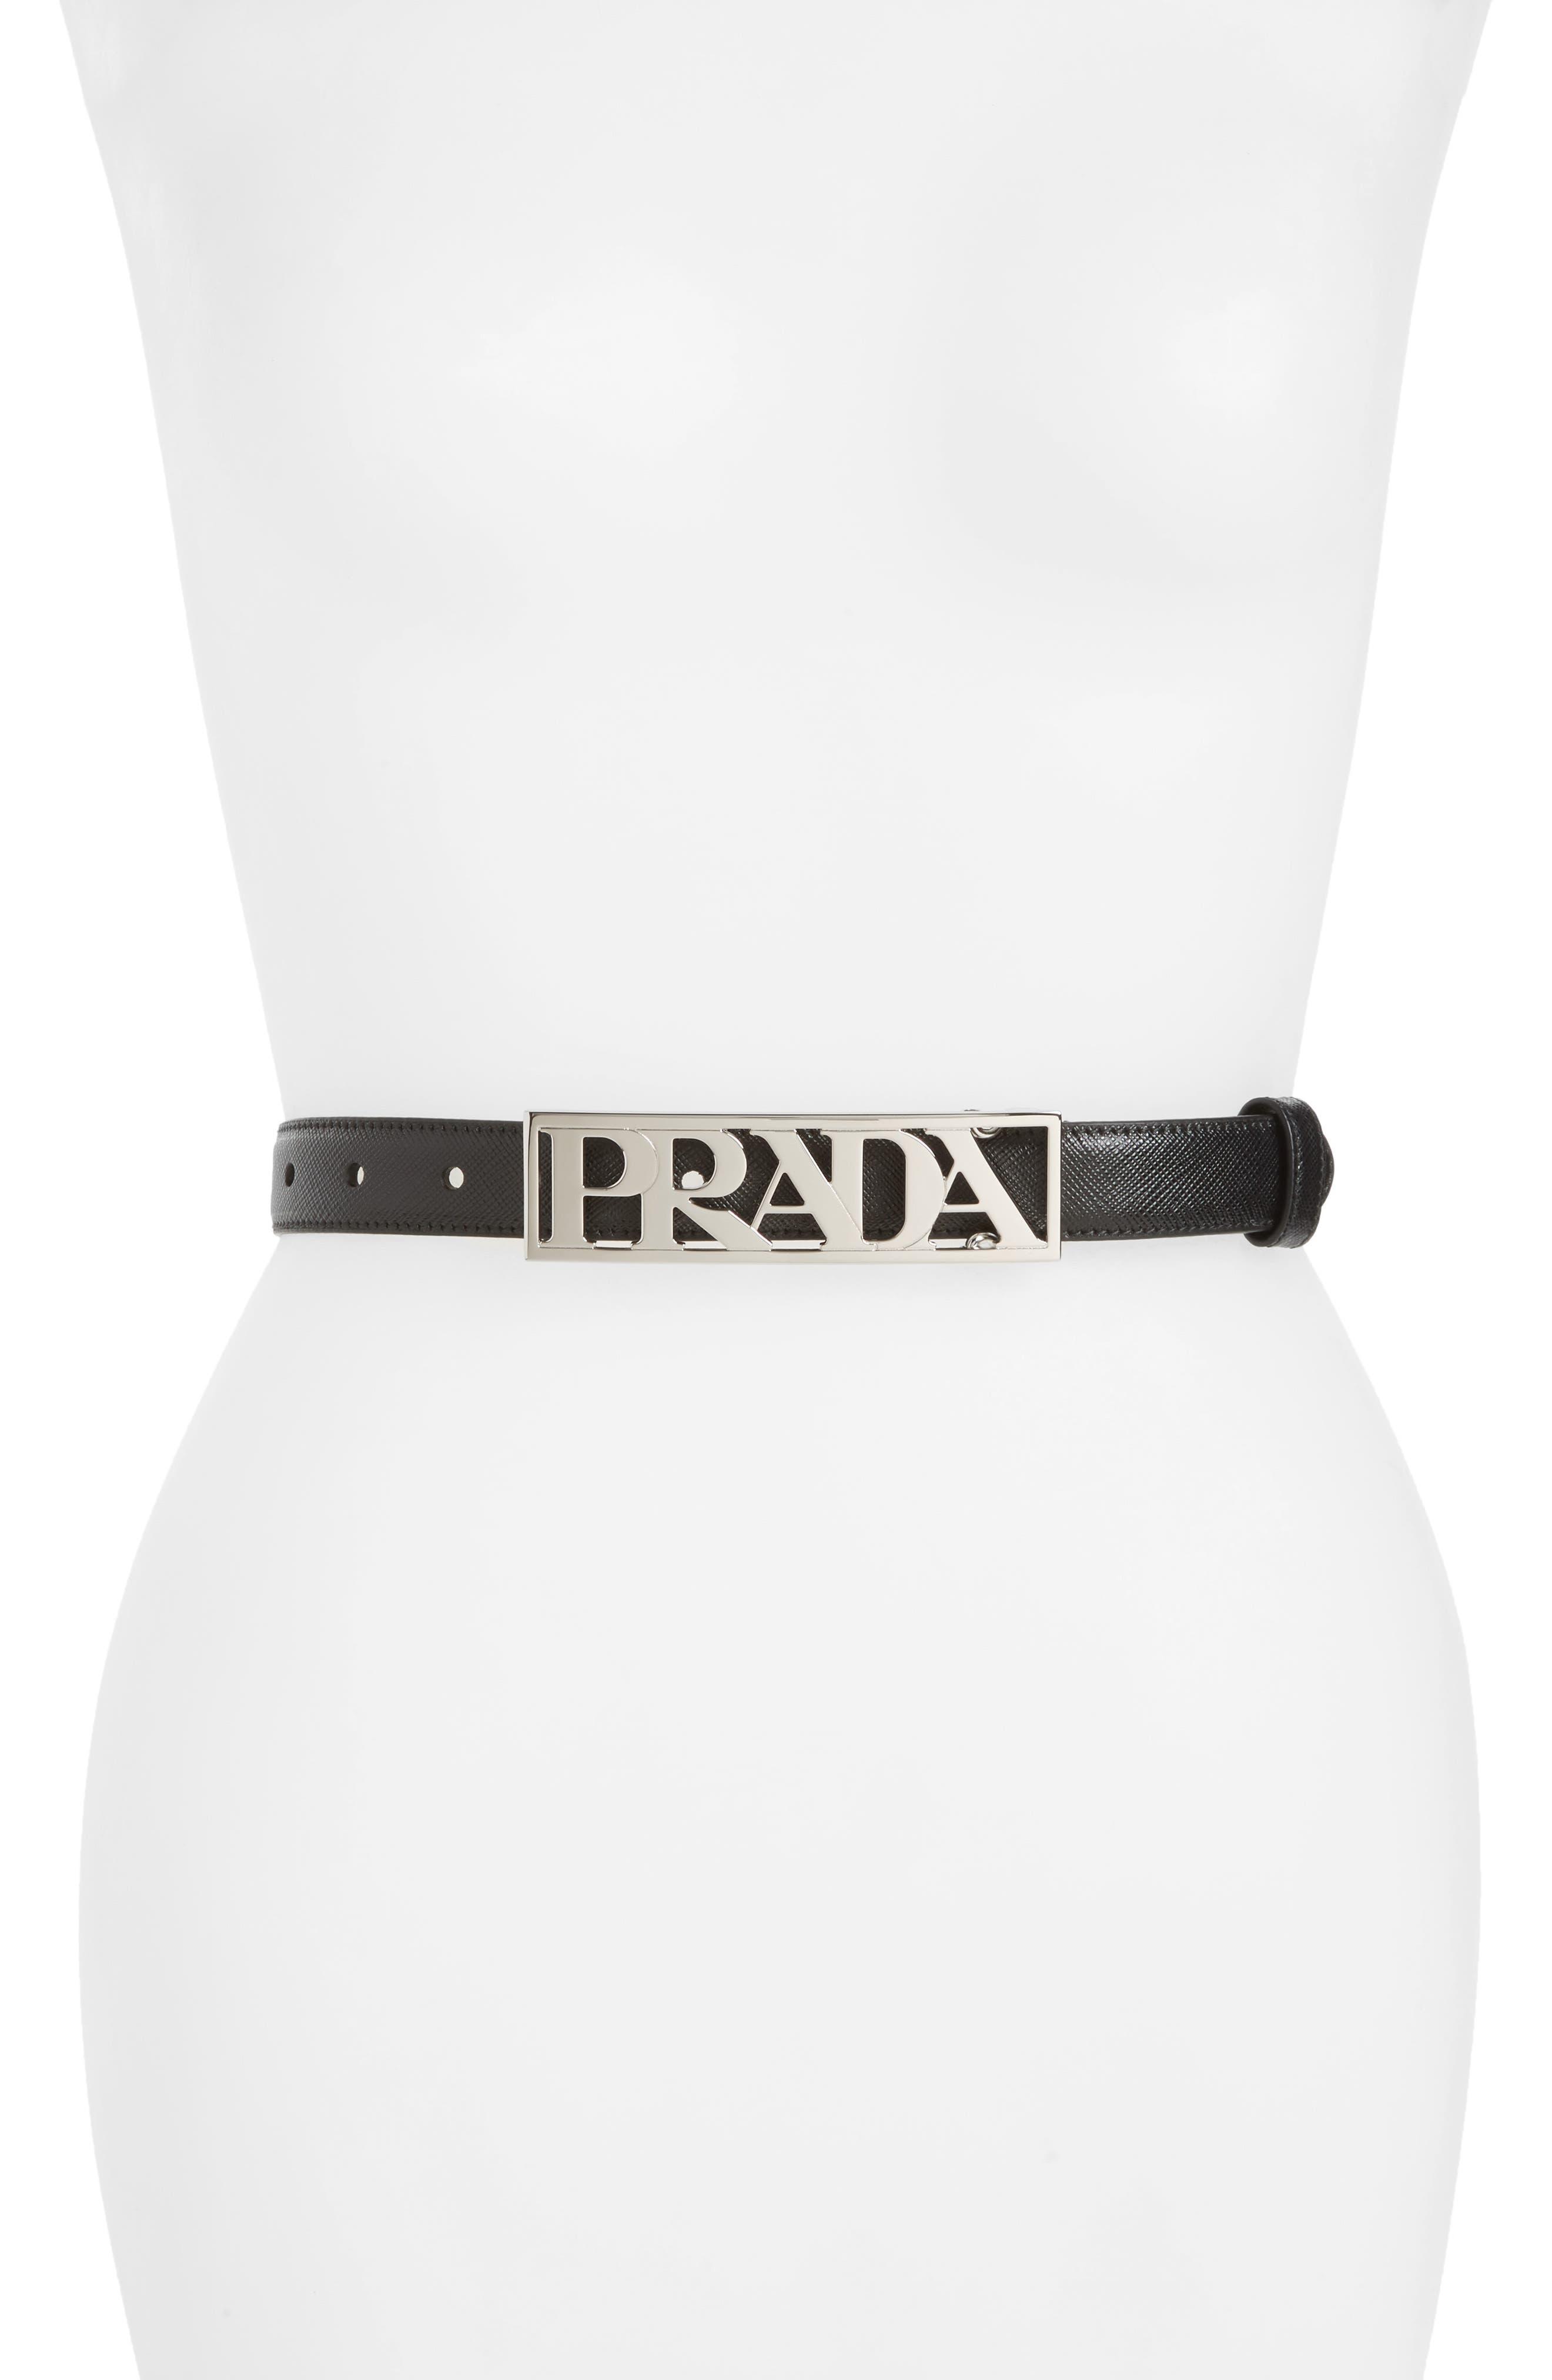 Prada Block Saffiano Calfskin Leather Skinny Belt